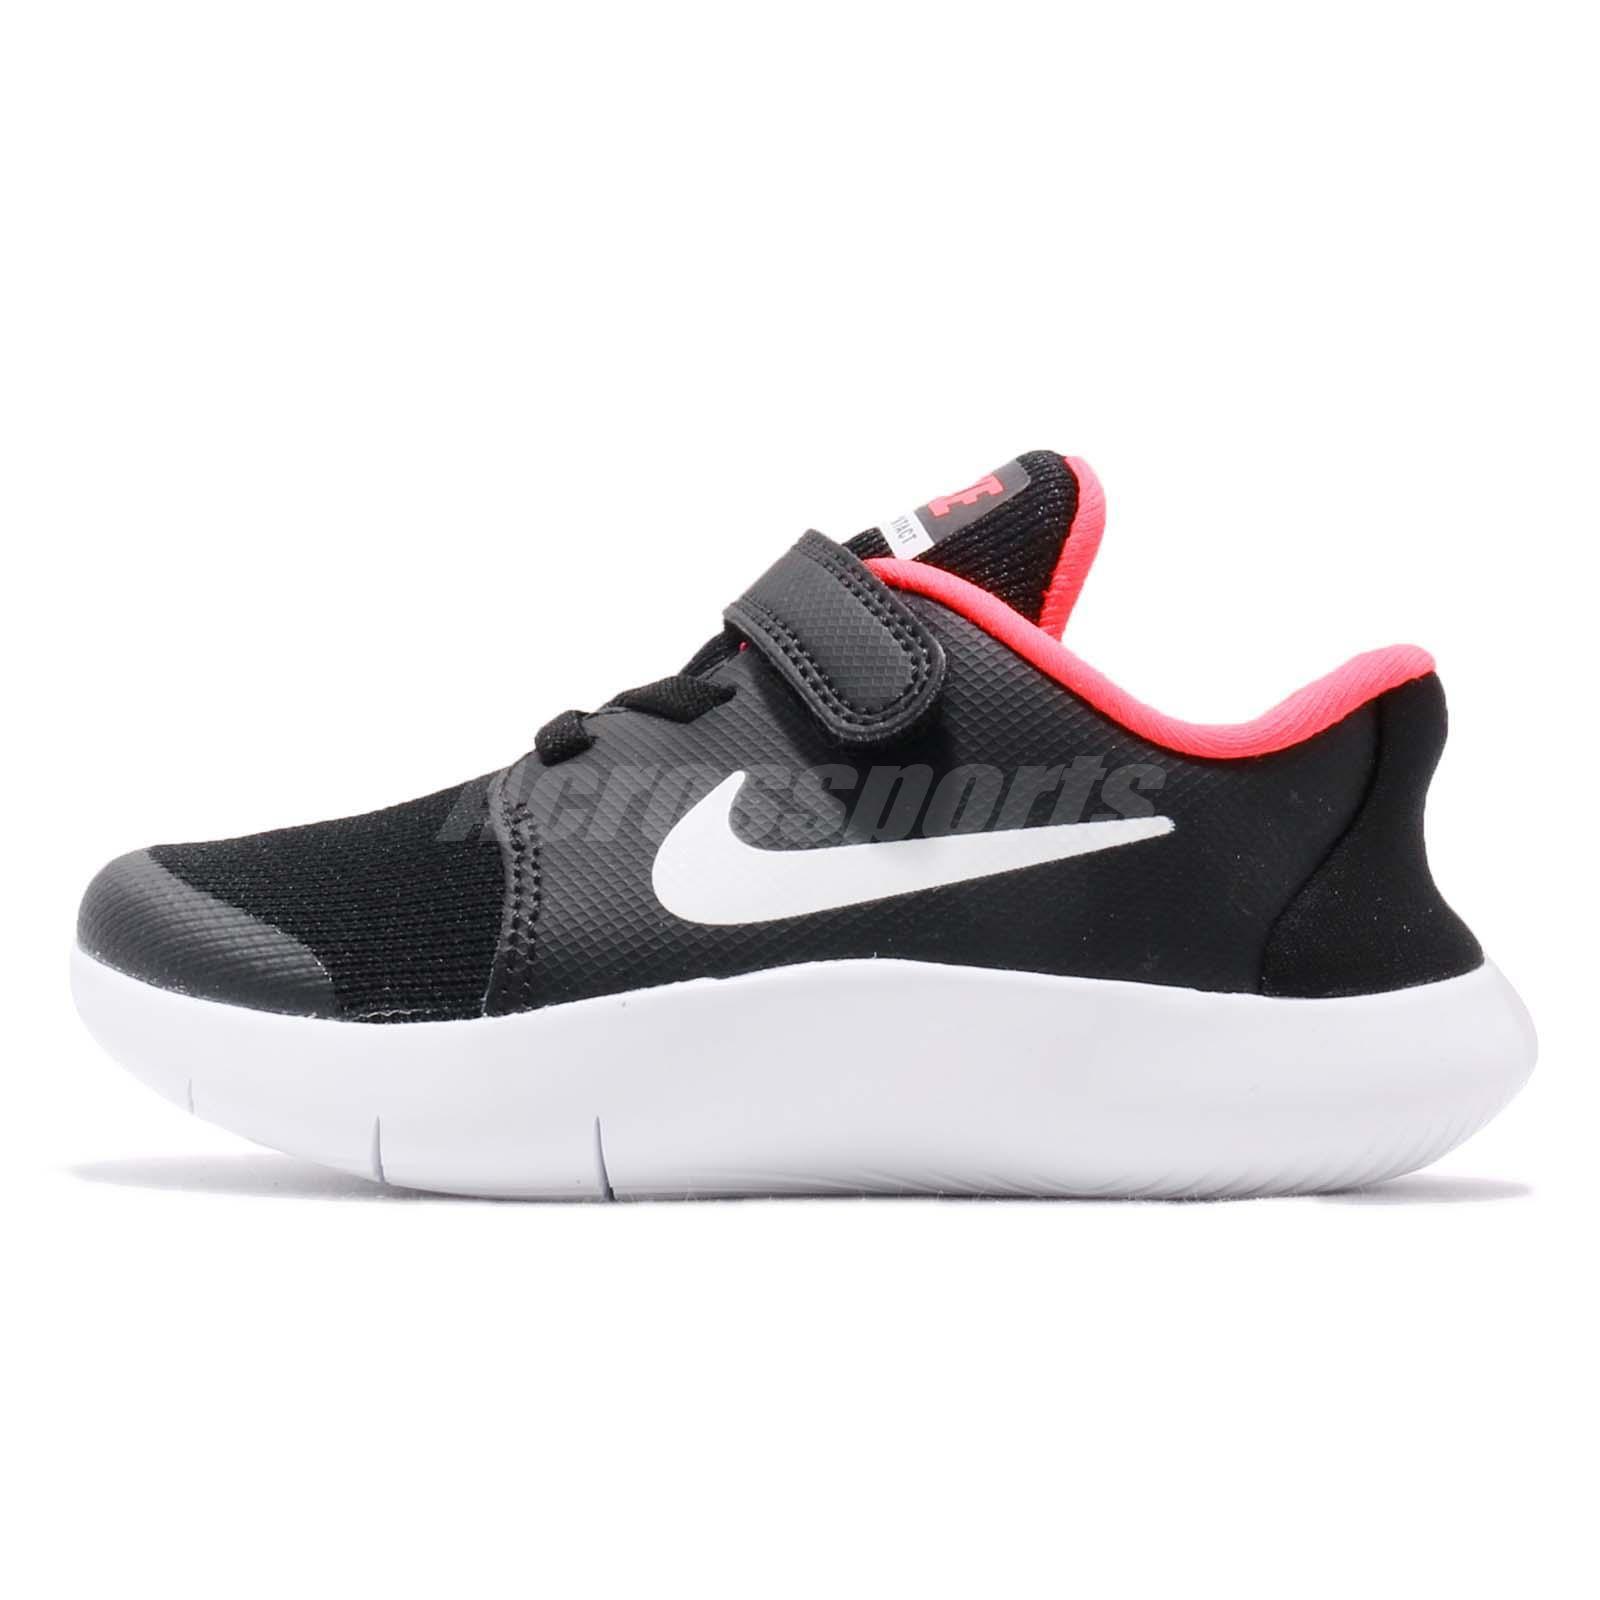 7c5c408e7230 Nike Flex Contact 2 TDV II Black White Toddler Infant Running Shoes  AH3450-001